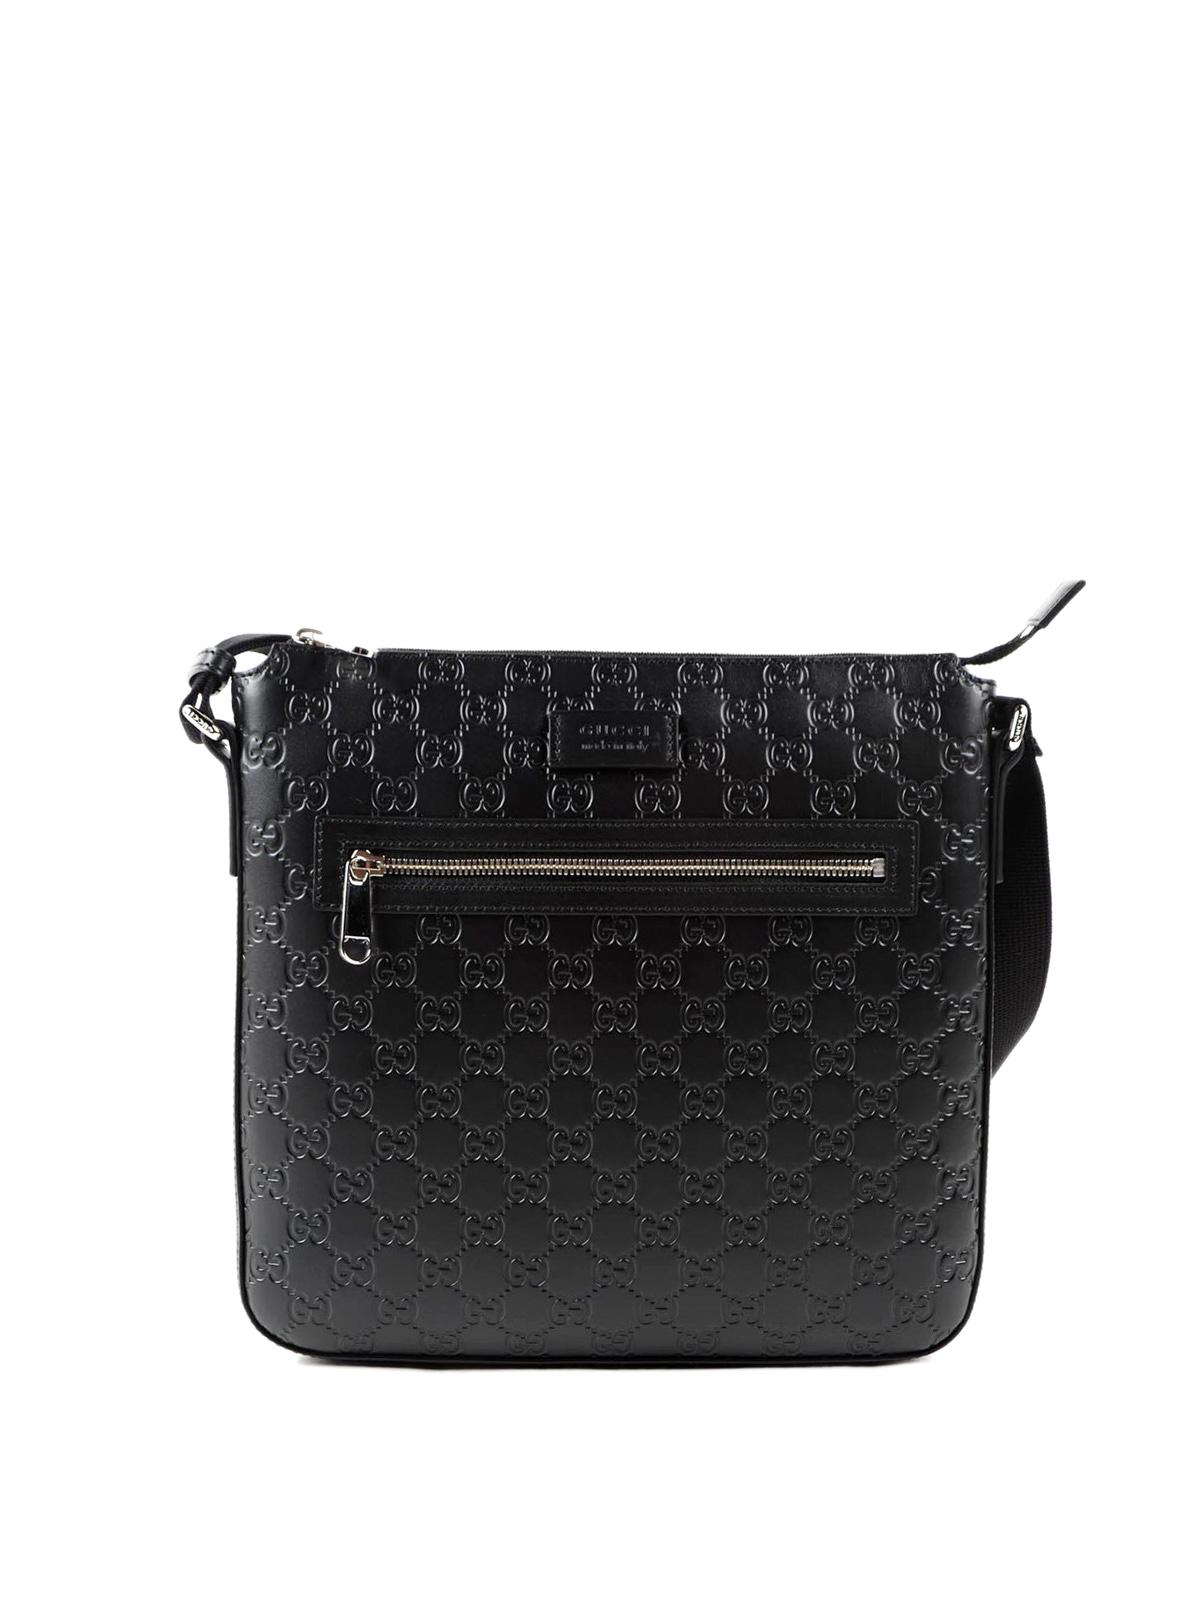 aa7fa3284 Gucci - Guccissima leather messenger bag - cross body bags ...